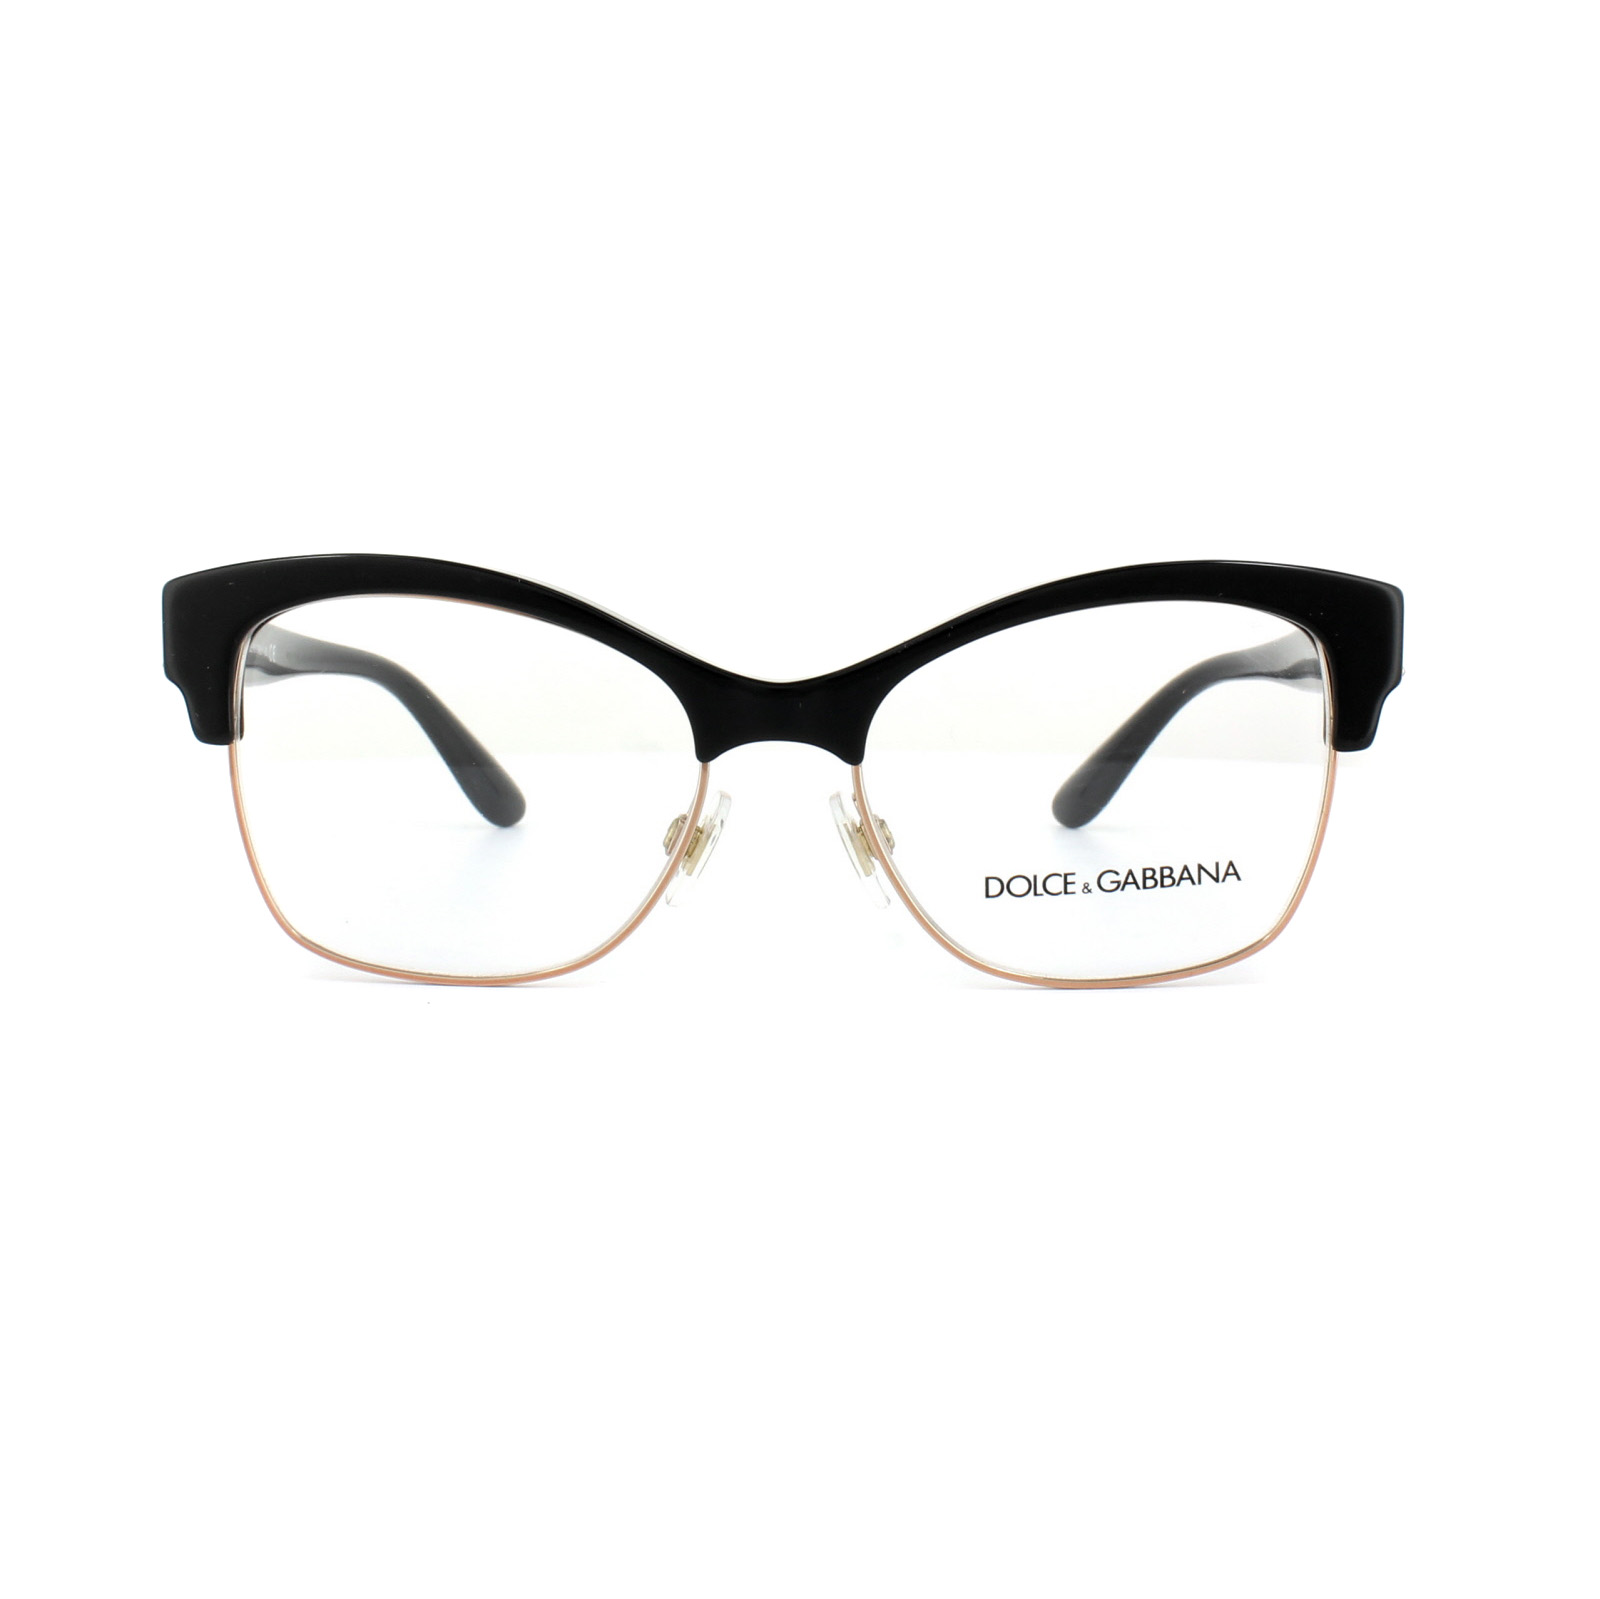 f83a491ff9f0 Sentinel Dolce and Gabbana Glasses Frames DG 3272 501 Black Womens 52mm